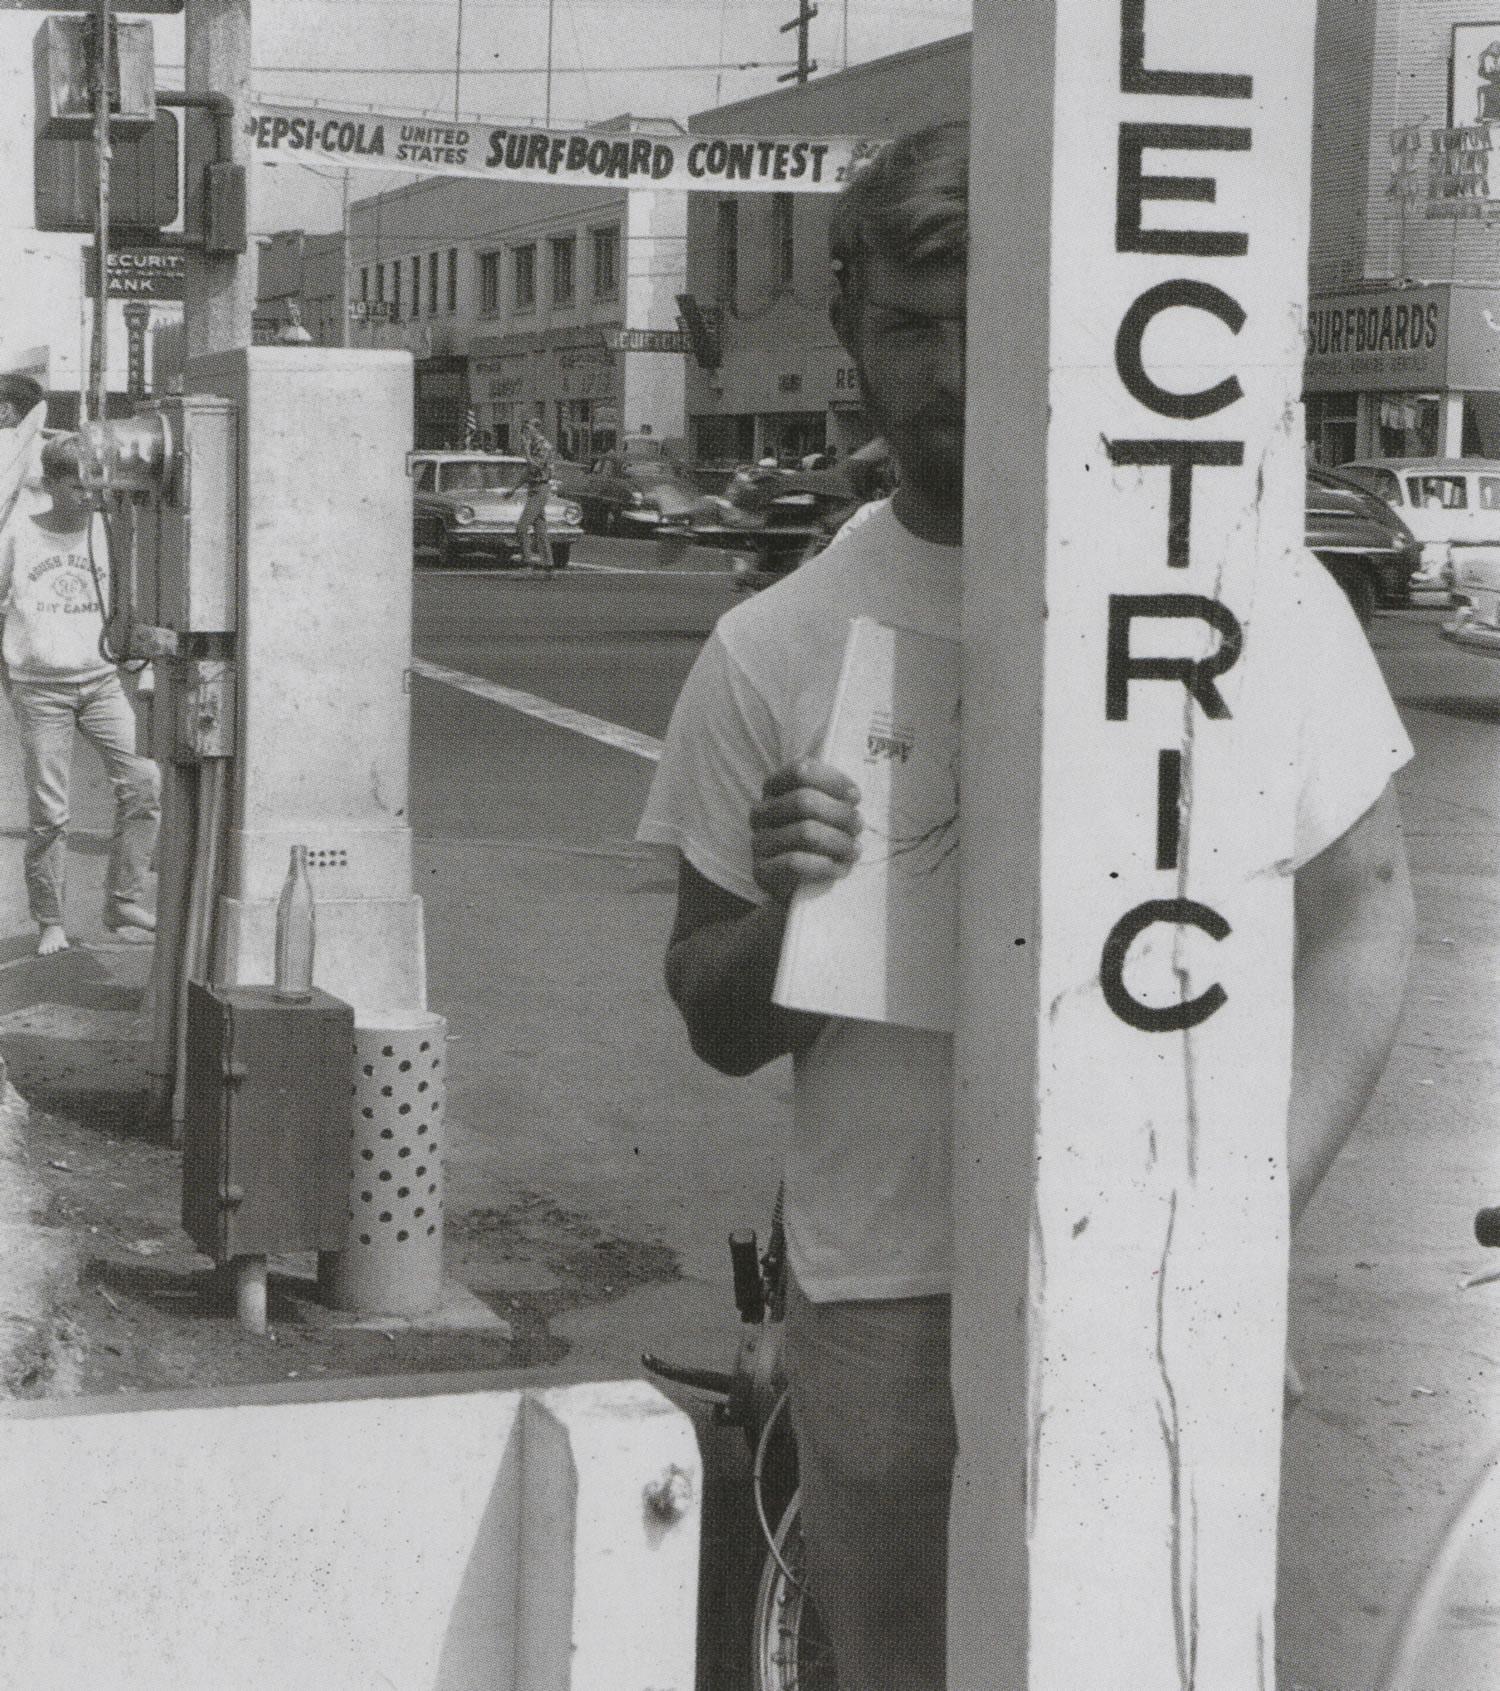 Rick Griffin U.S. Surfing Championships, Huntington Beach, CA 1964